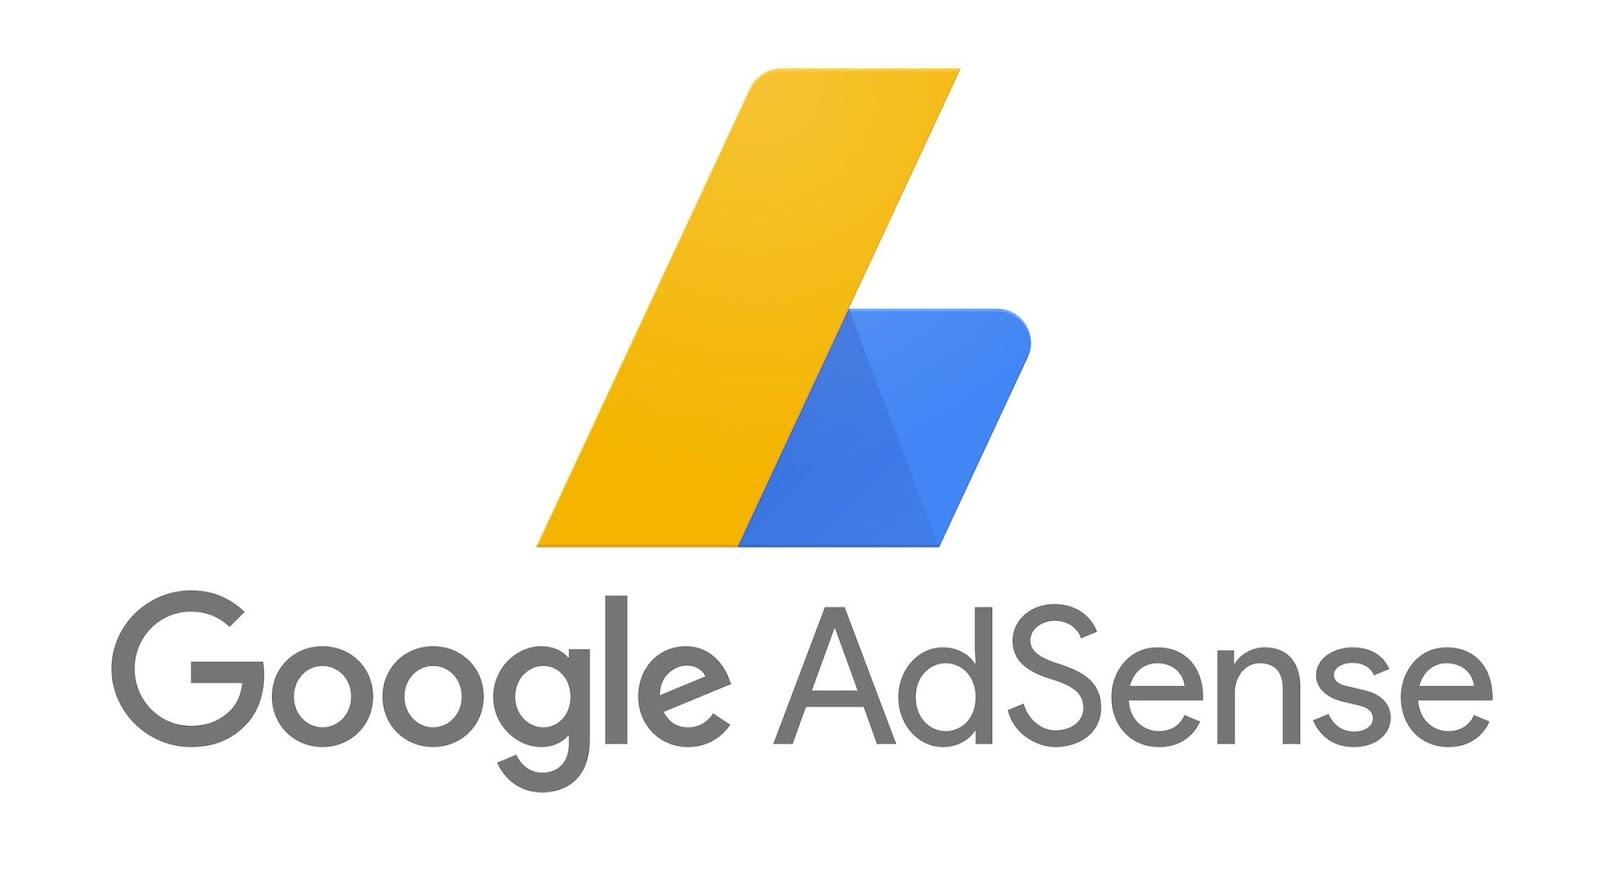 Google Adsense Antara Ekspetasi dan Realita